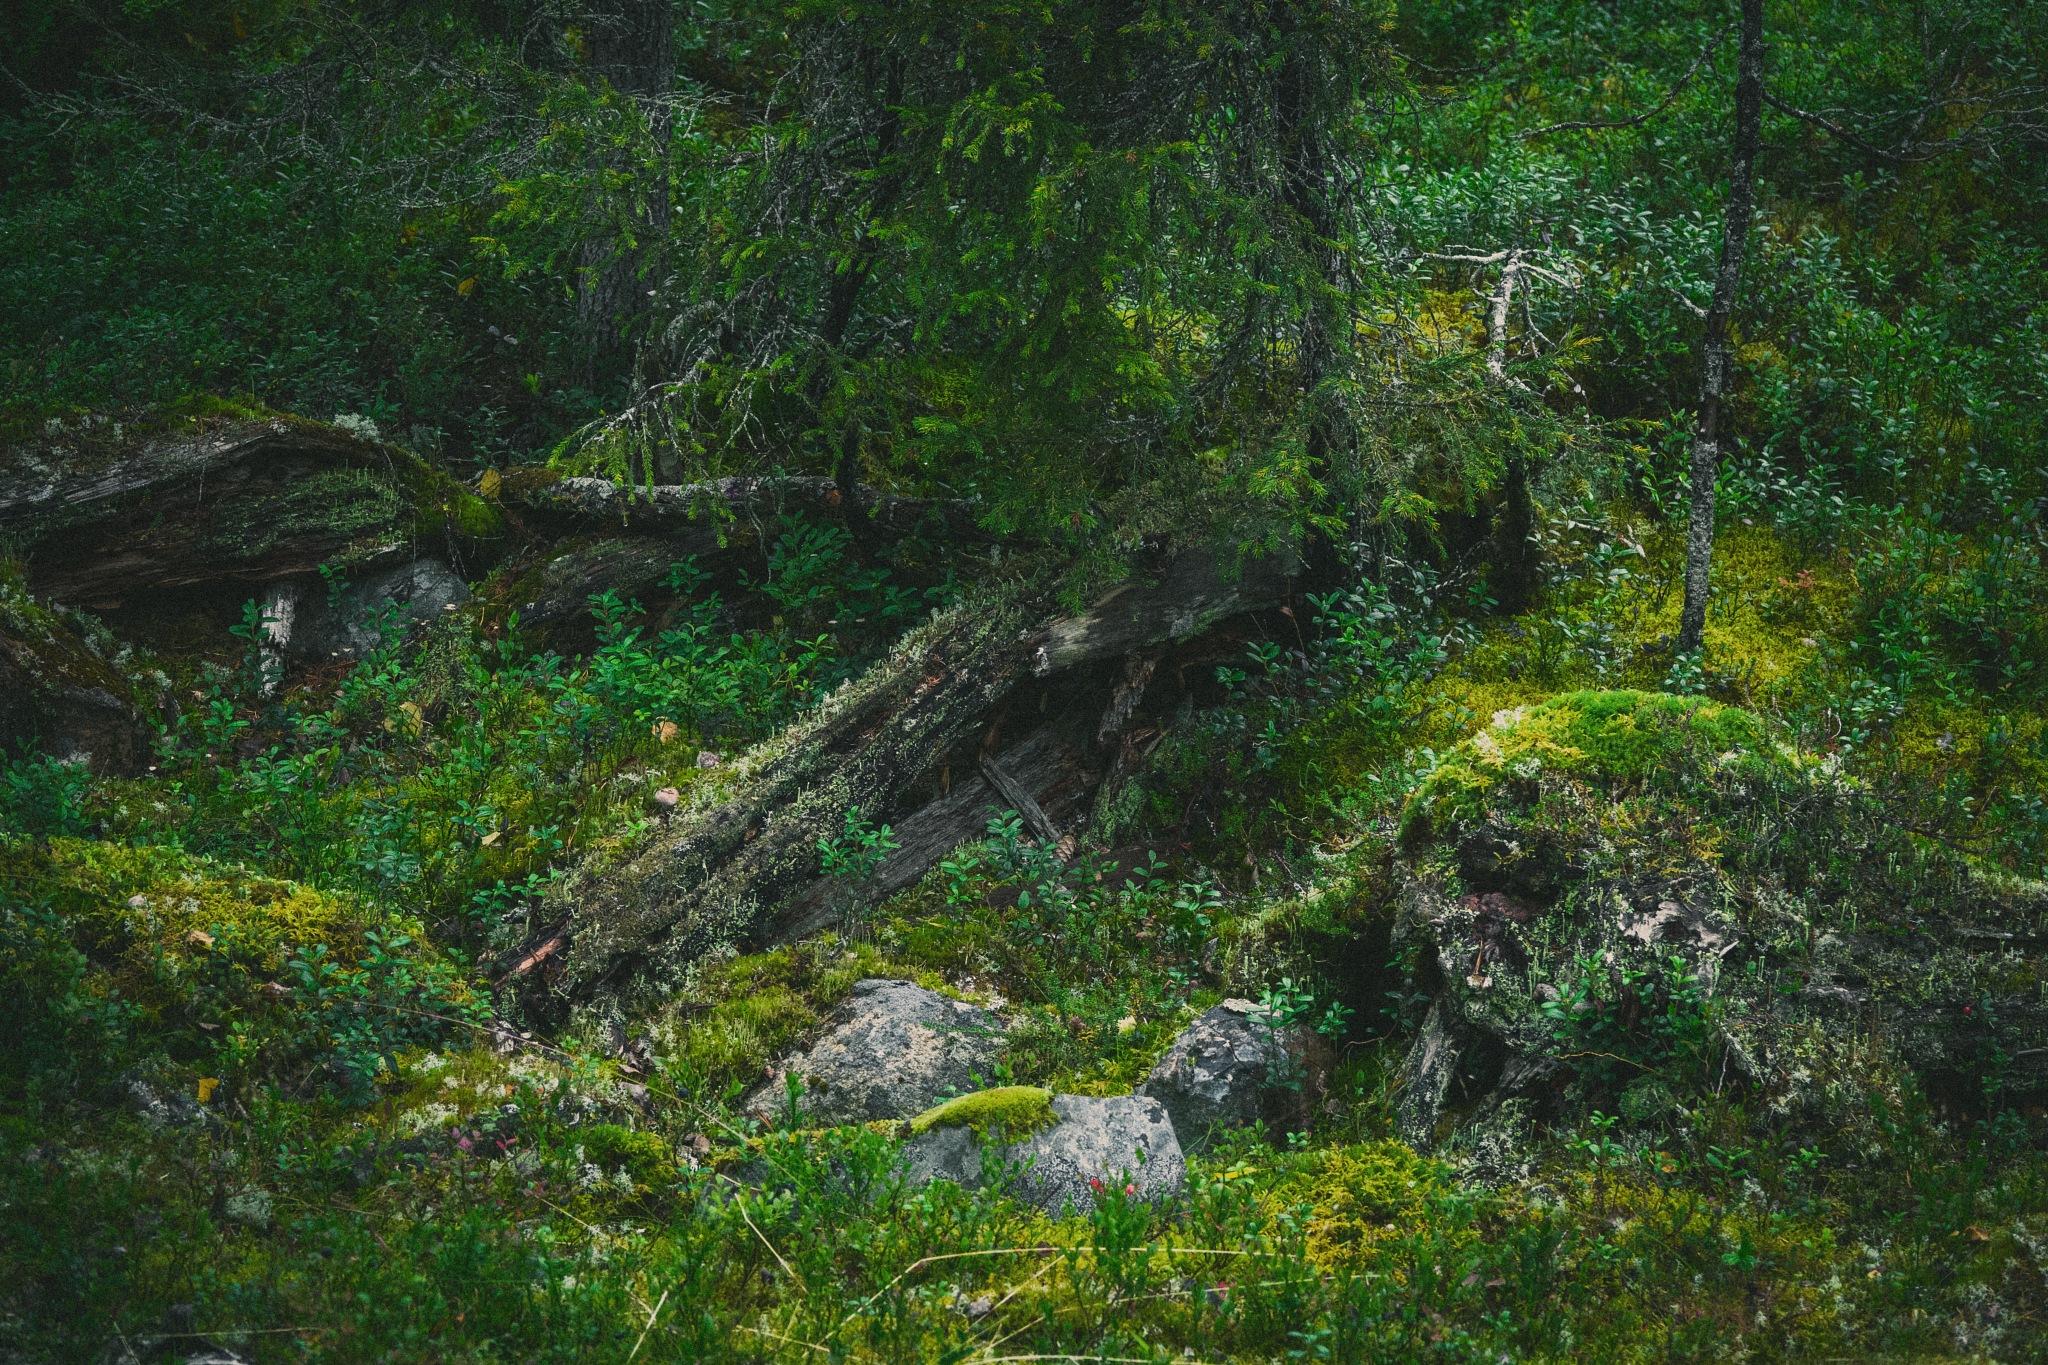 Biome by Juuso Voutilainen